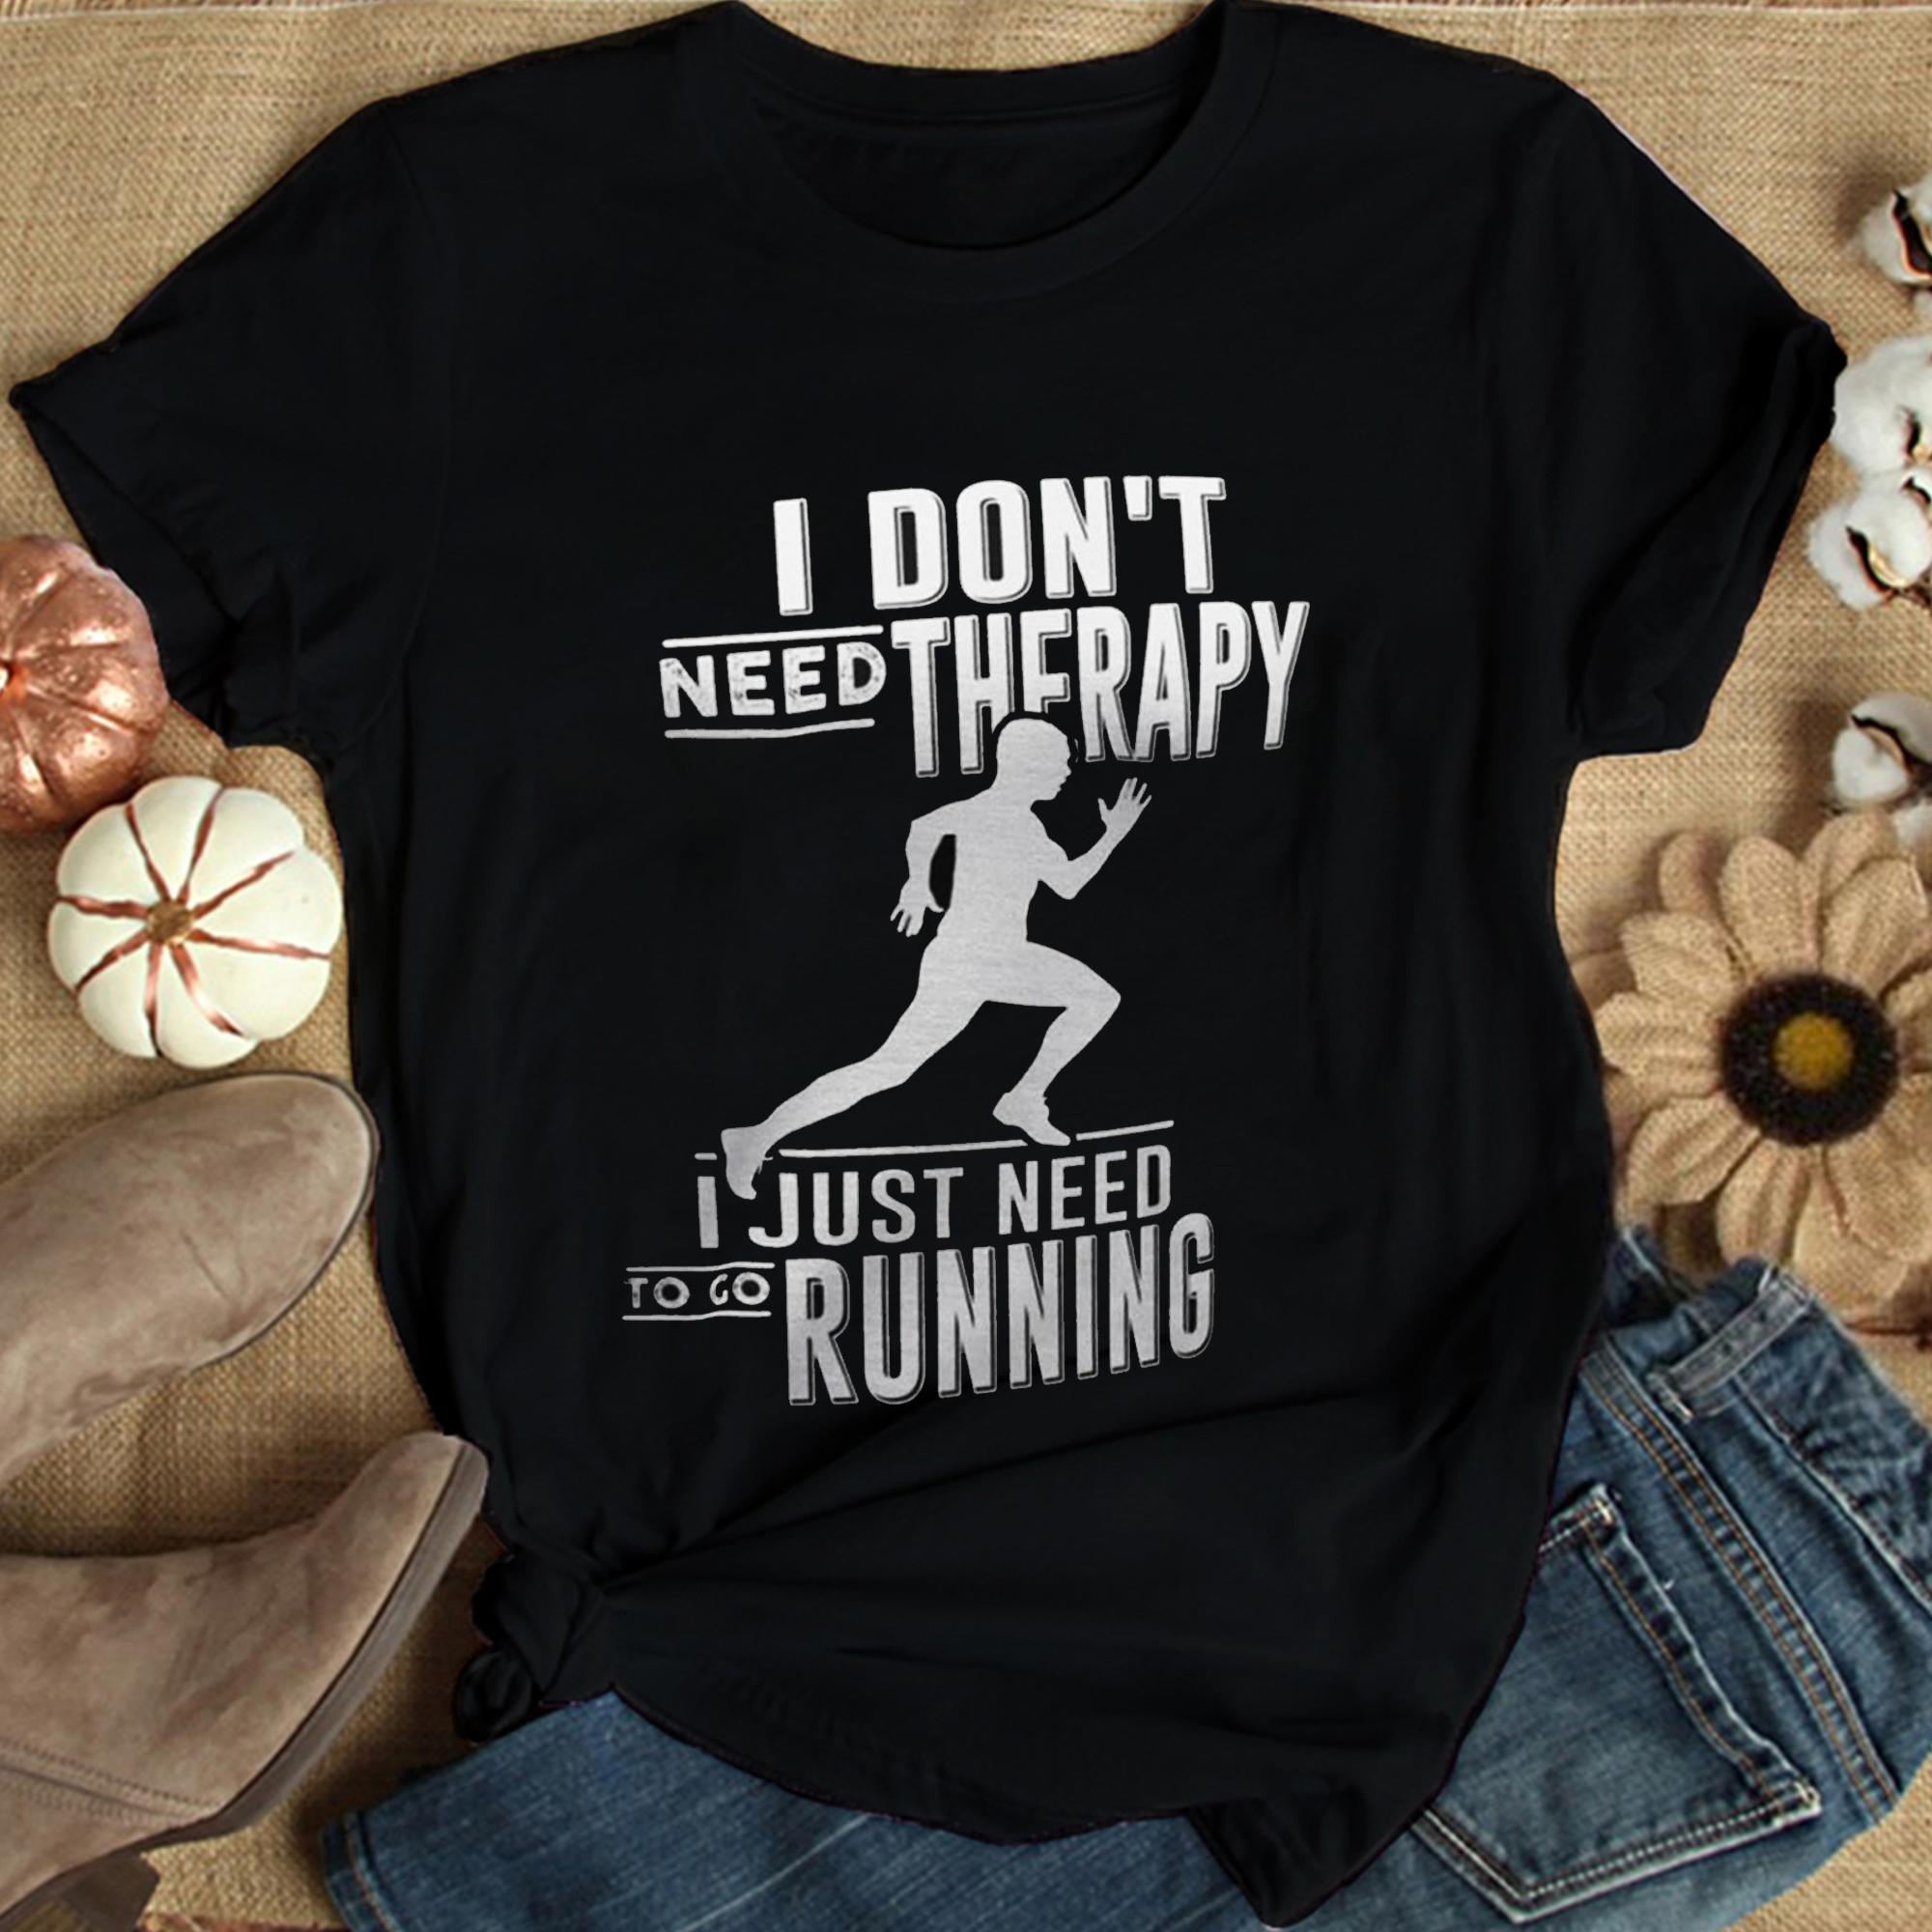 Running Shirt Don't Need Therapy Need Running